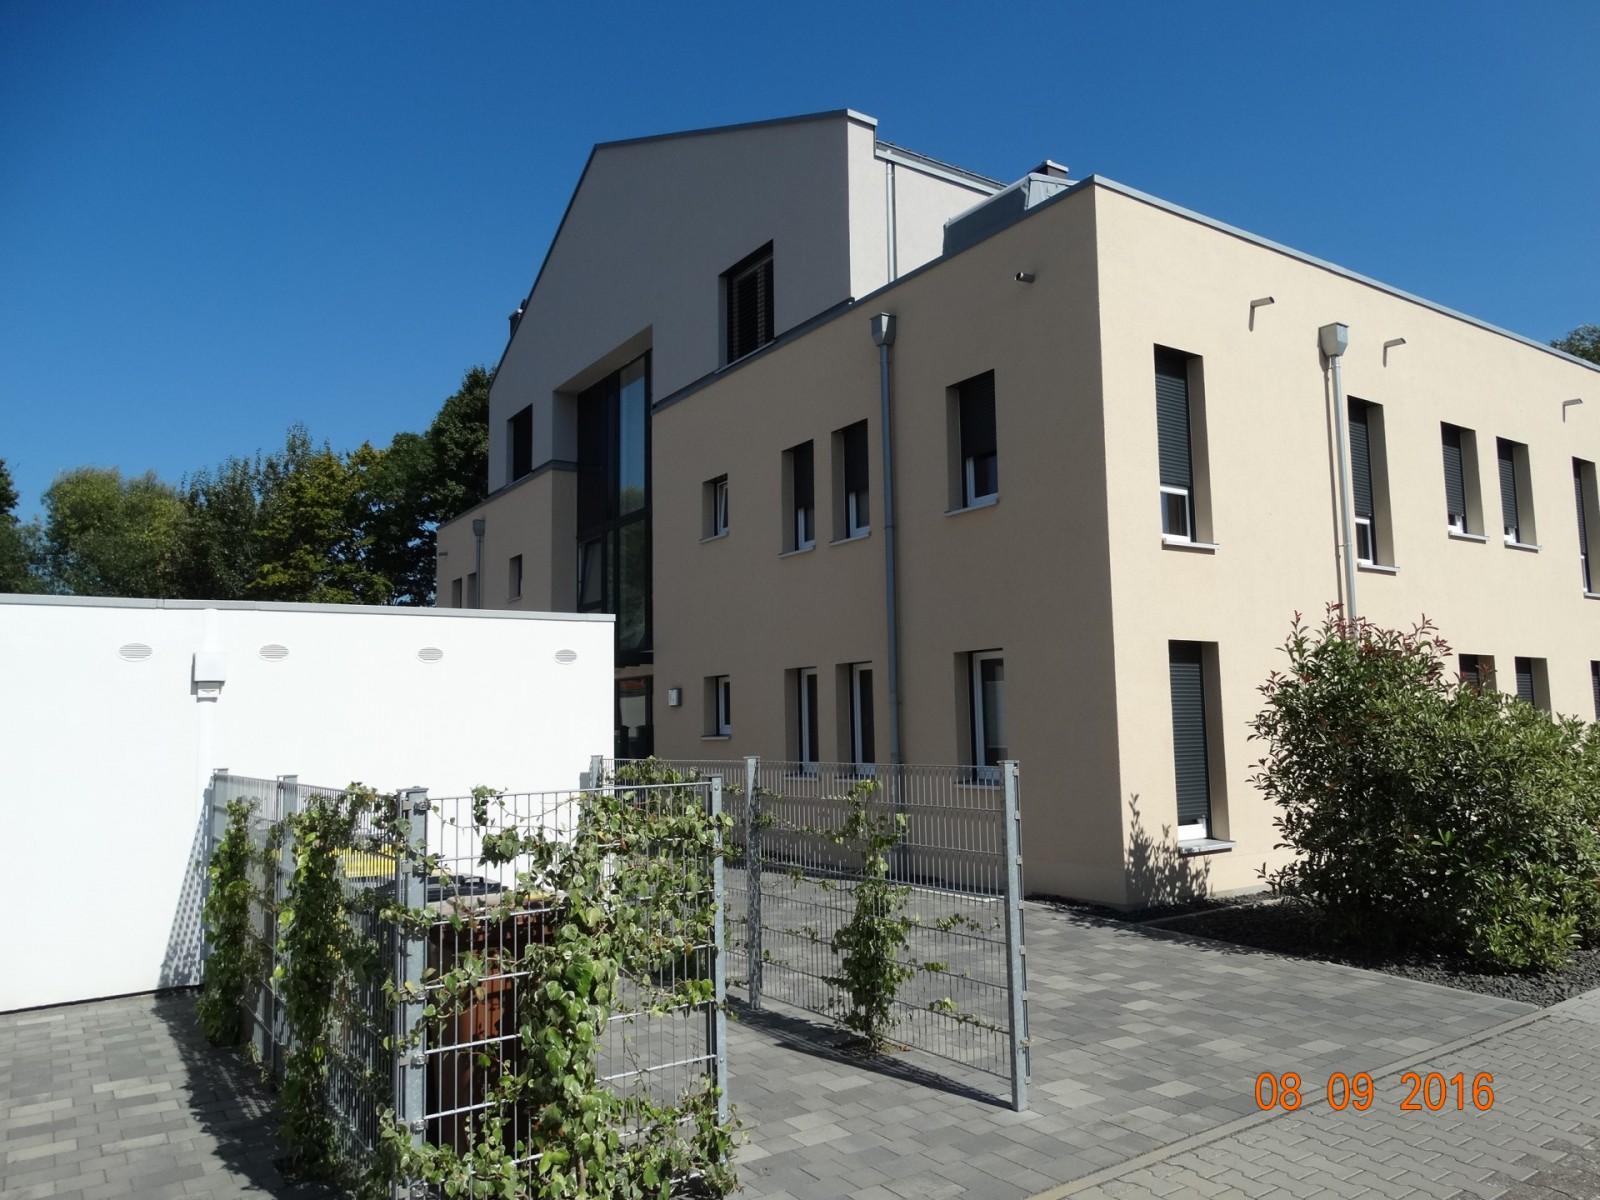 XAL_Wohnhaus_1_2_1920x1440